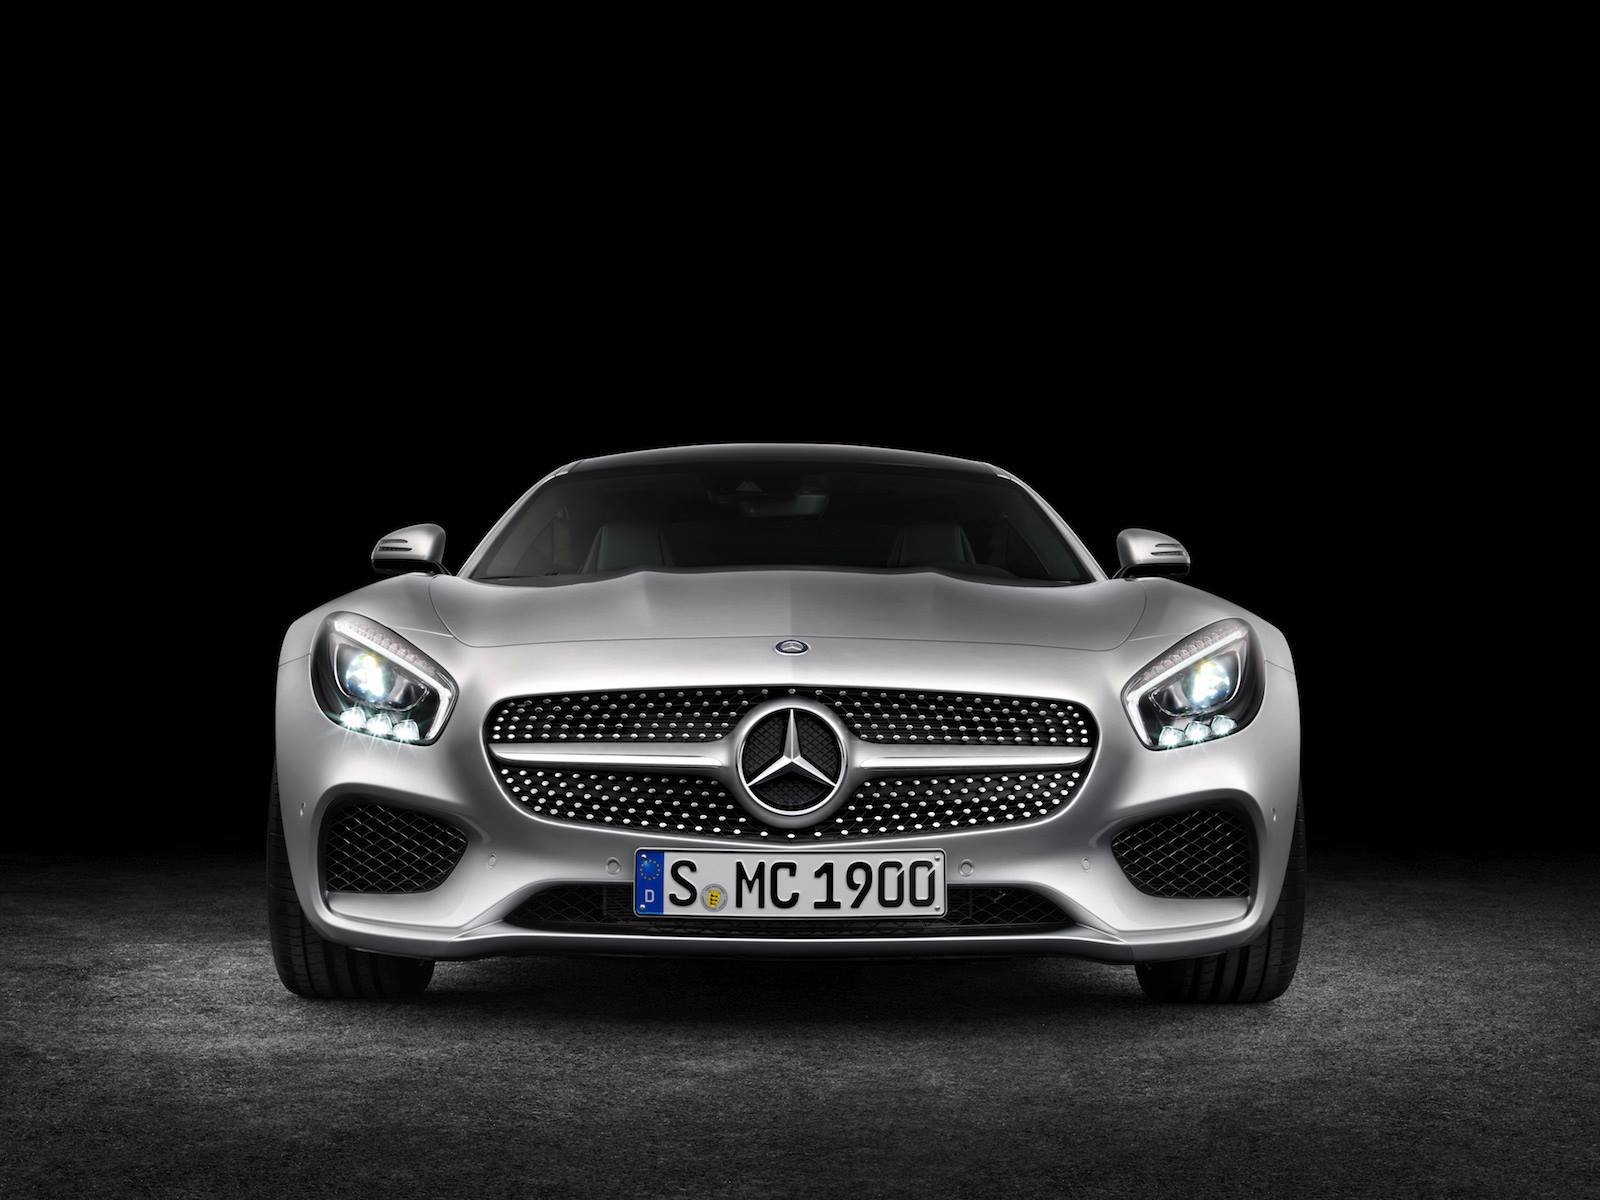 Mercedes-Benz  New Mercedes-Benz AMG GT  10560569 10152716492336670 994014531576596625 o